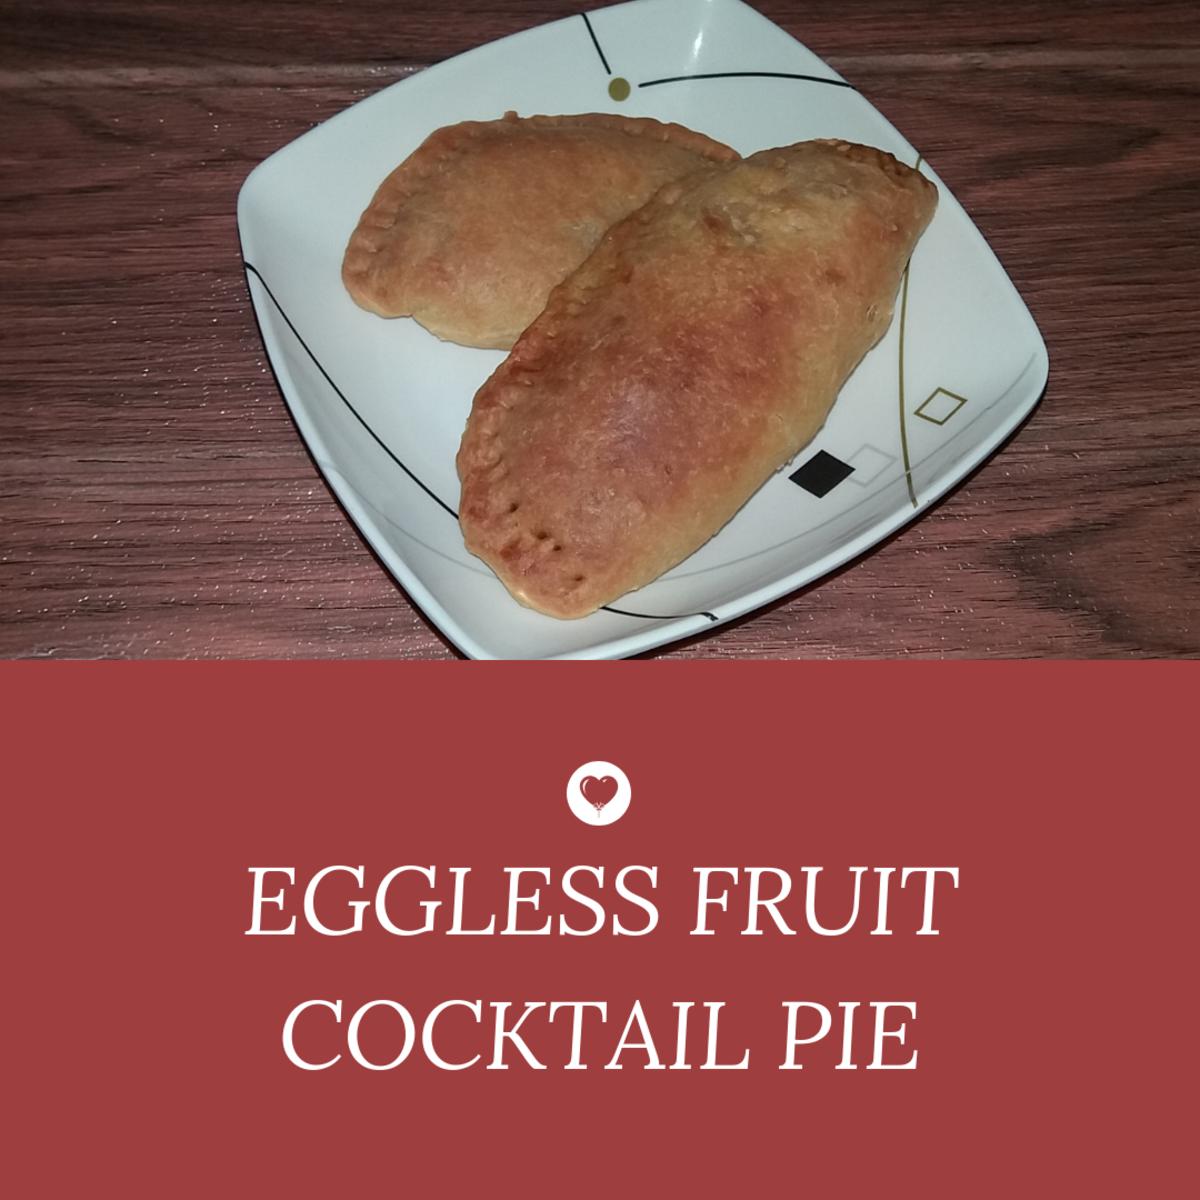 Egg-Free Fruit Cocktail Pie